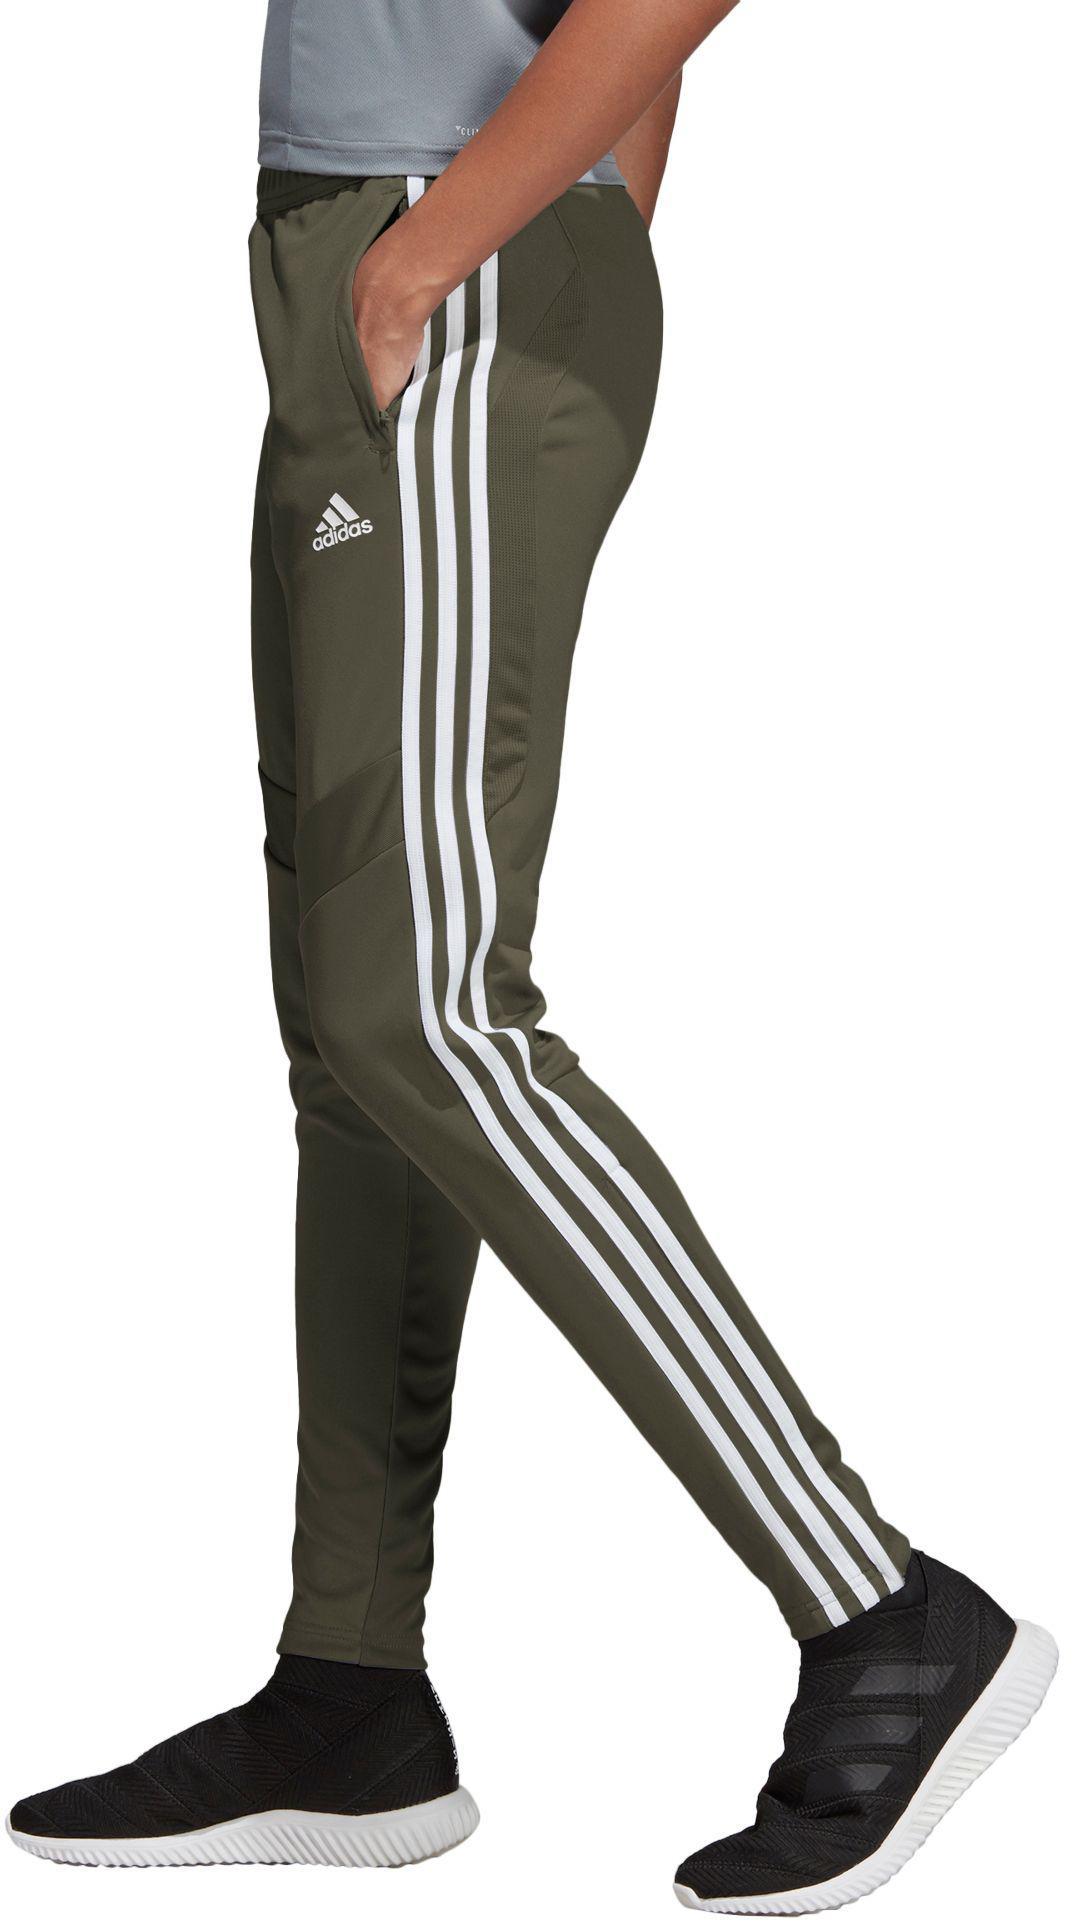 8a79510d69 Adidas Green Tiro 19 Training Pants